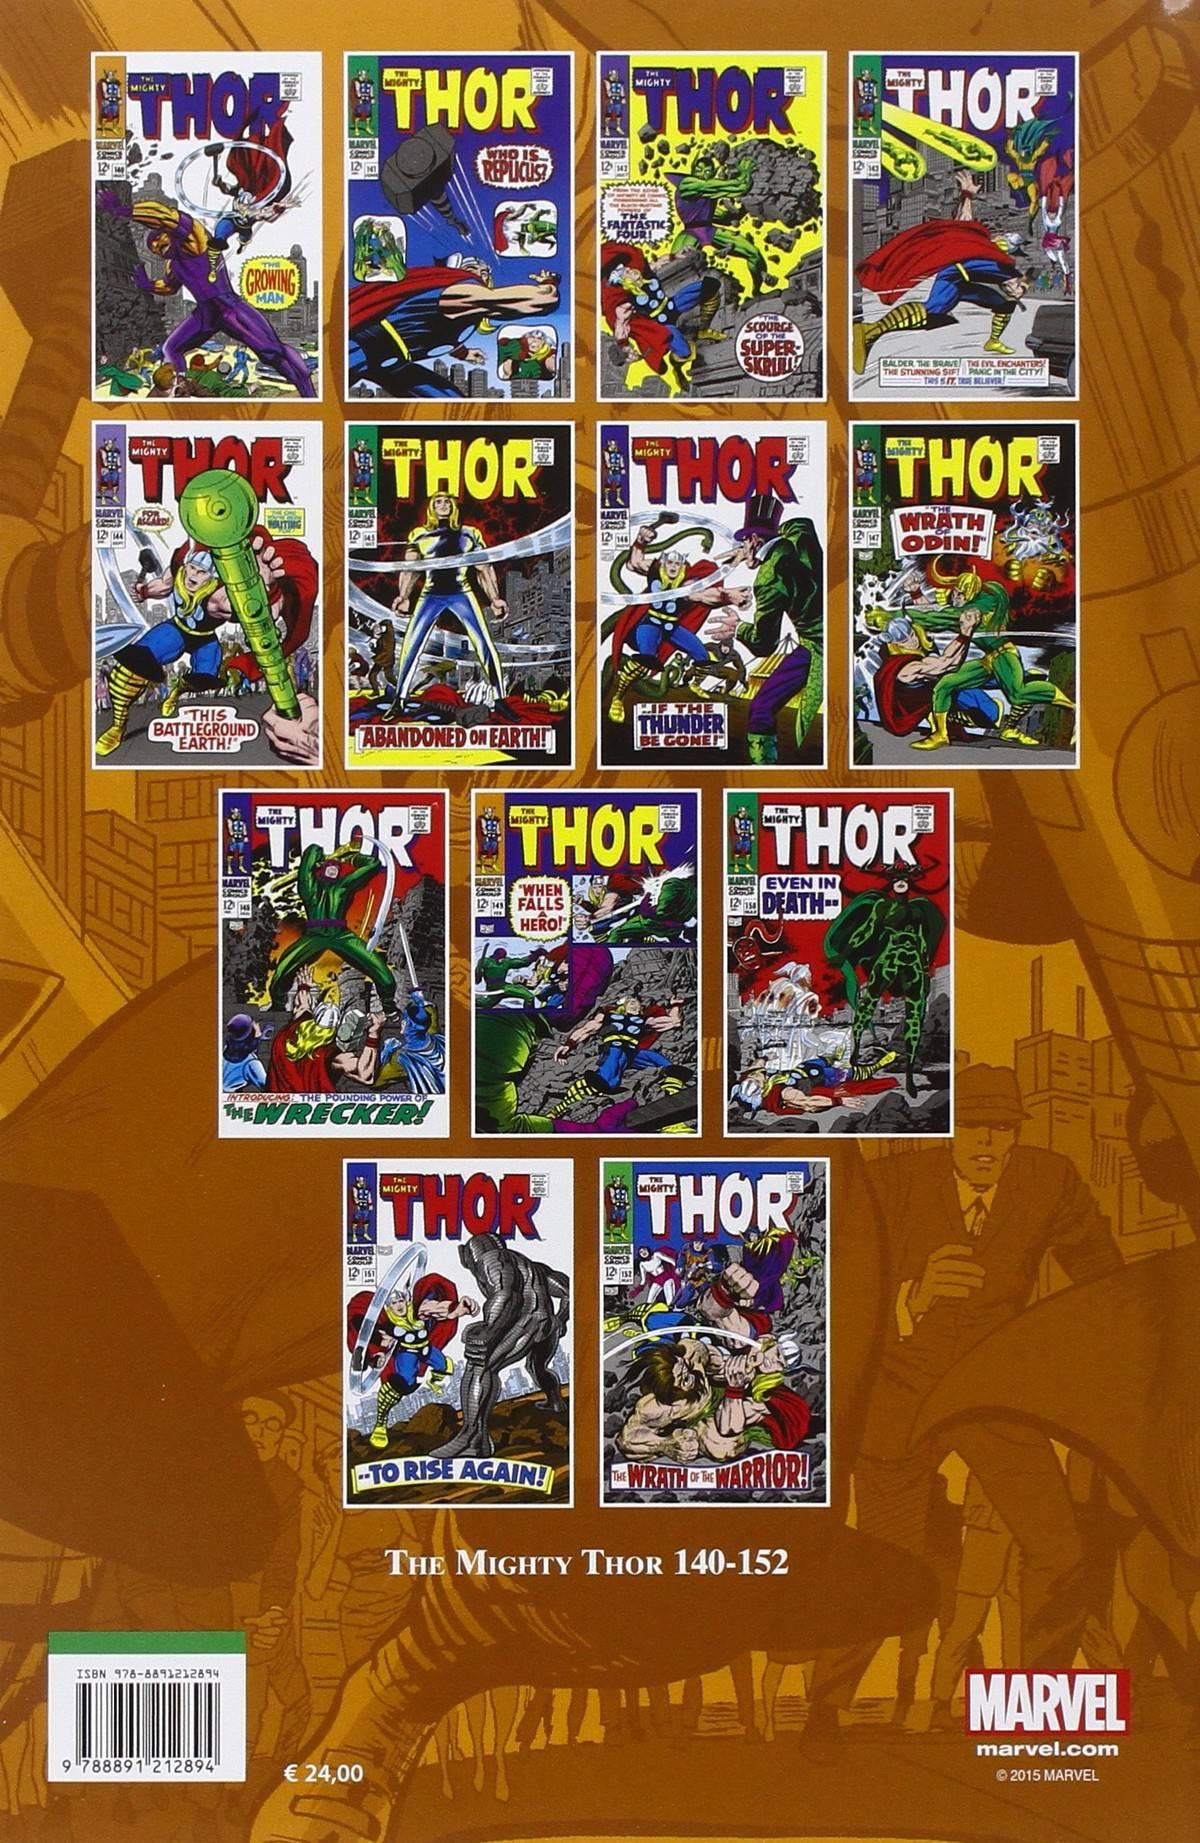 Marvel_Masterworks_Thor_4_panini_retro